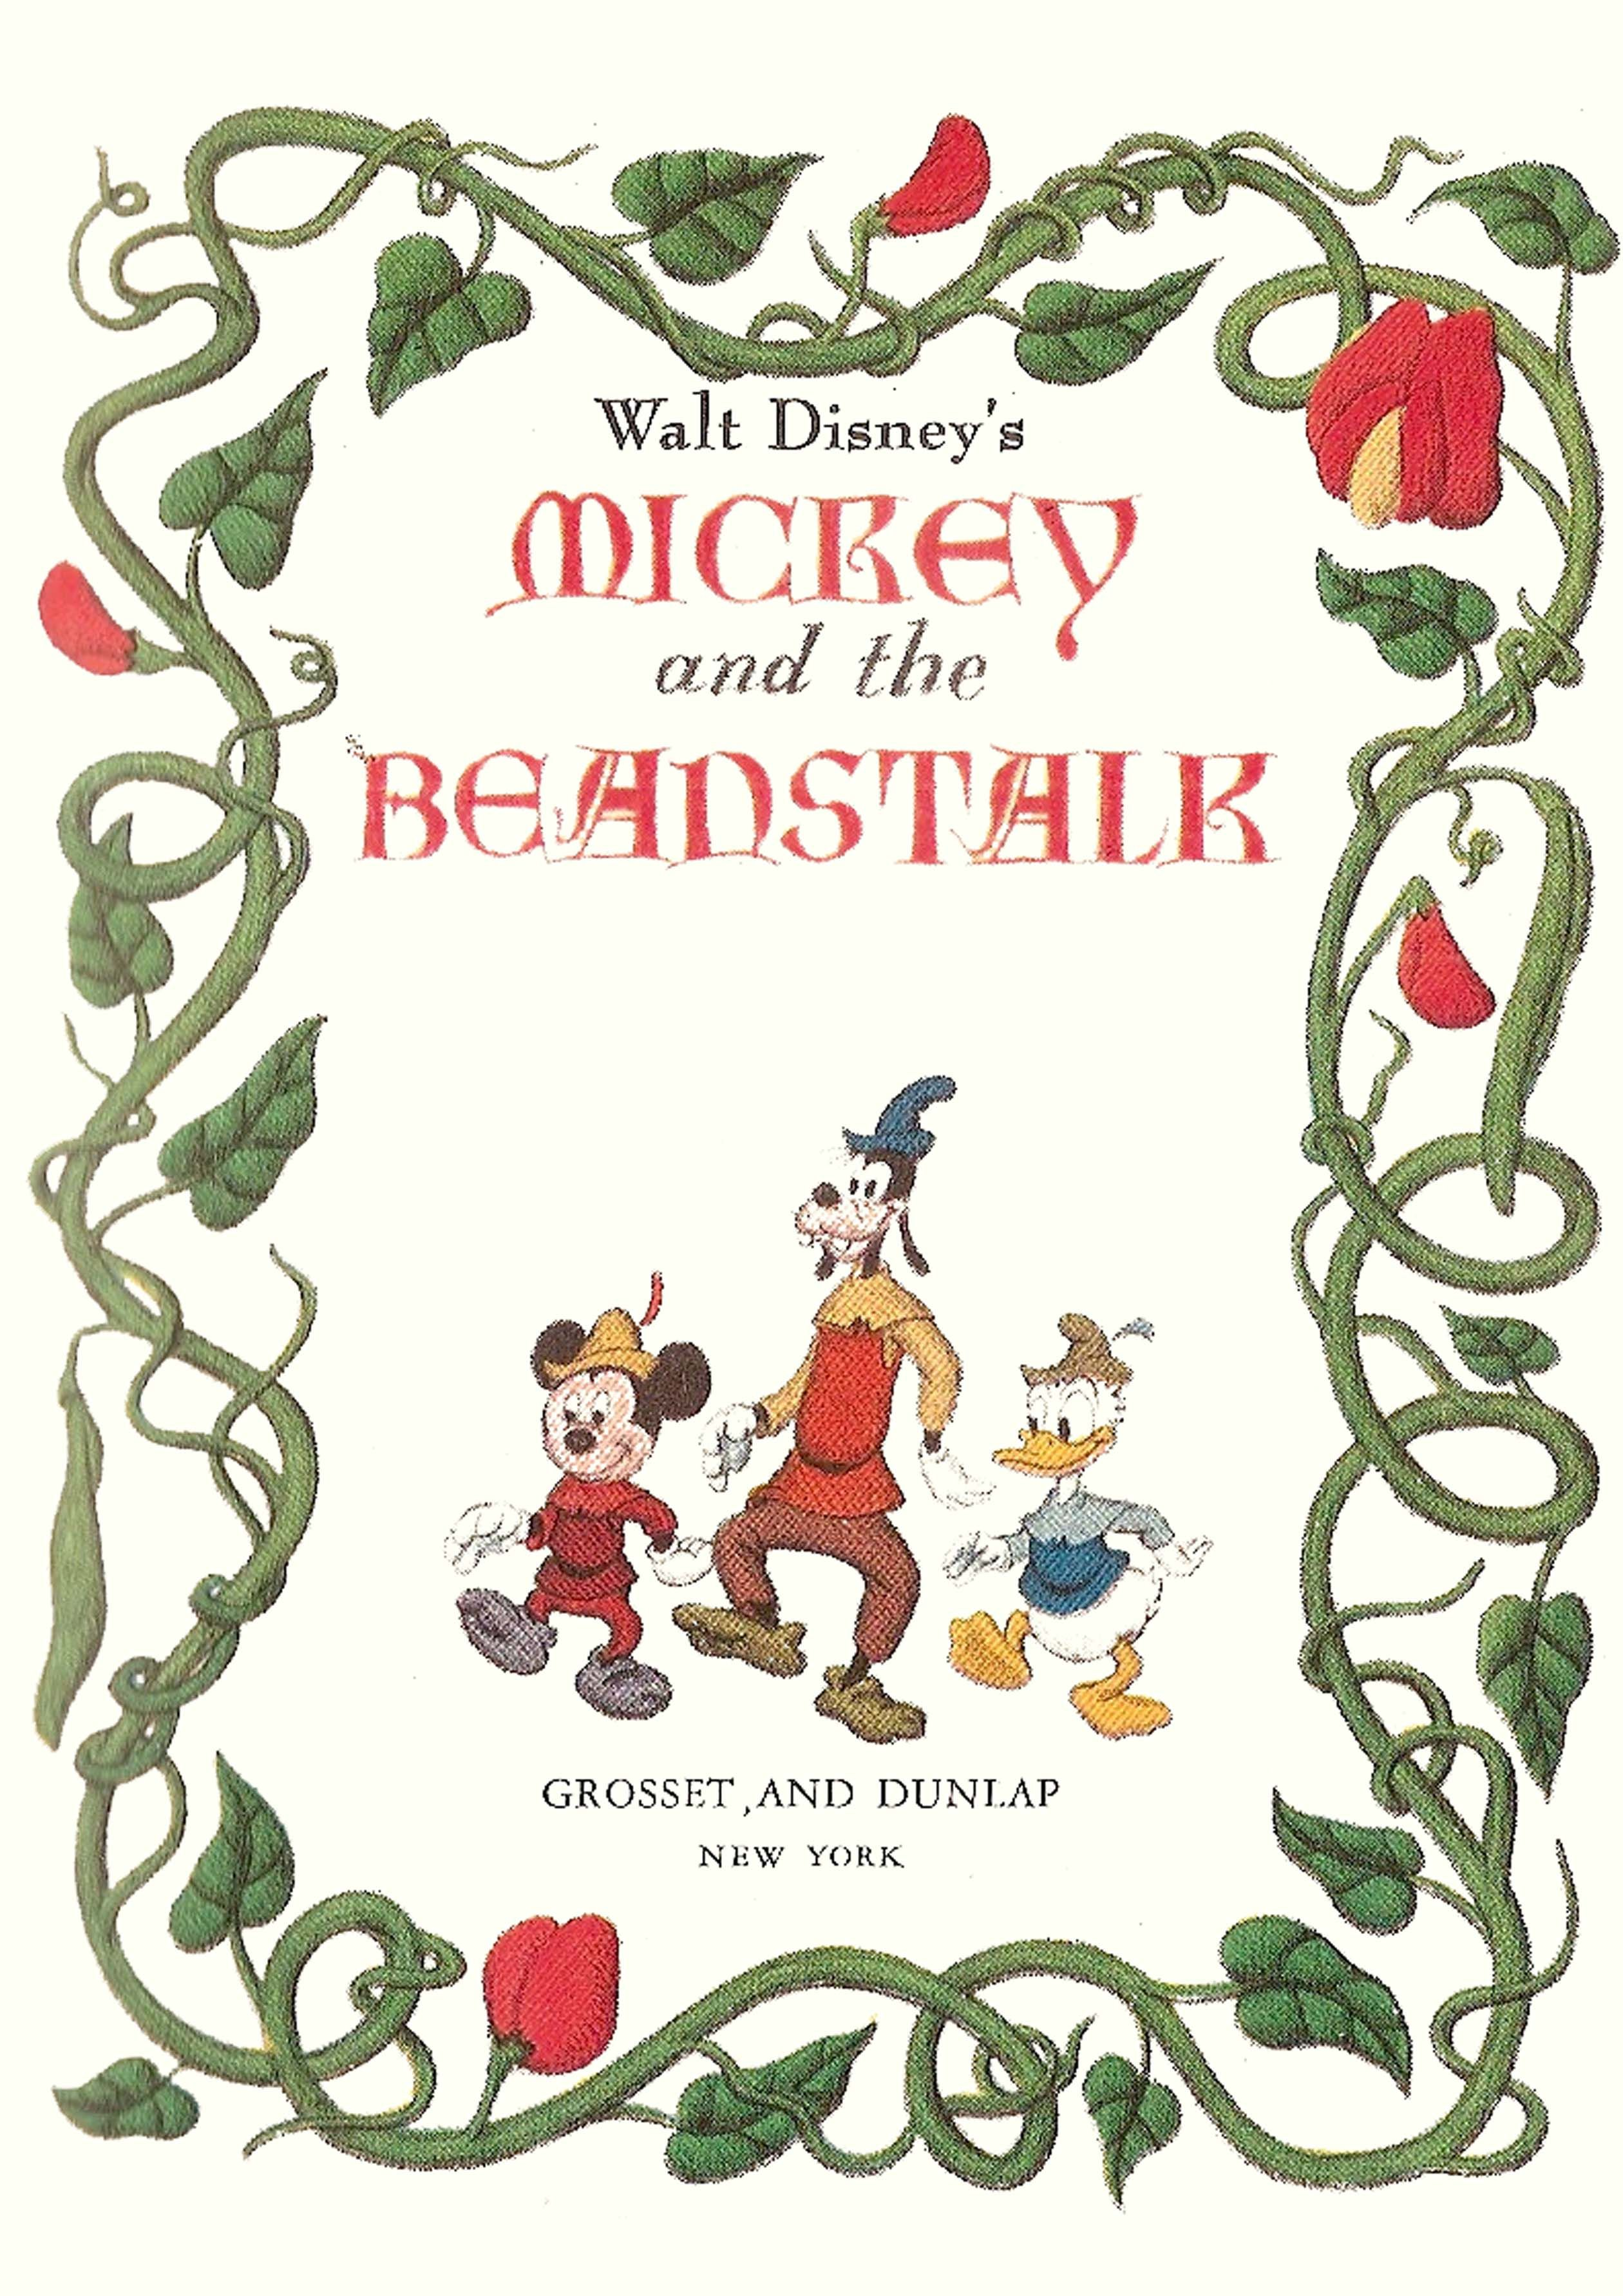 Mickey The Beanstalk Cover Book Vintage Disney Disney Posters Disney Books